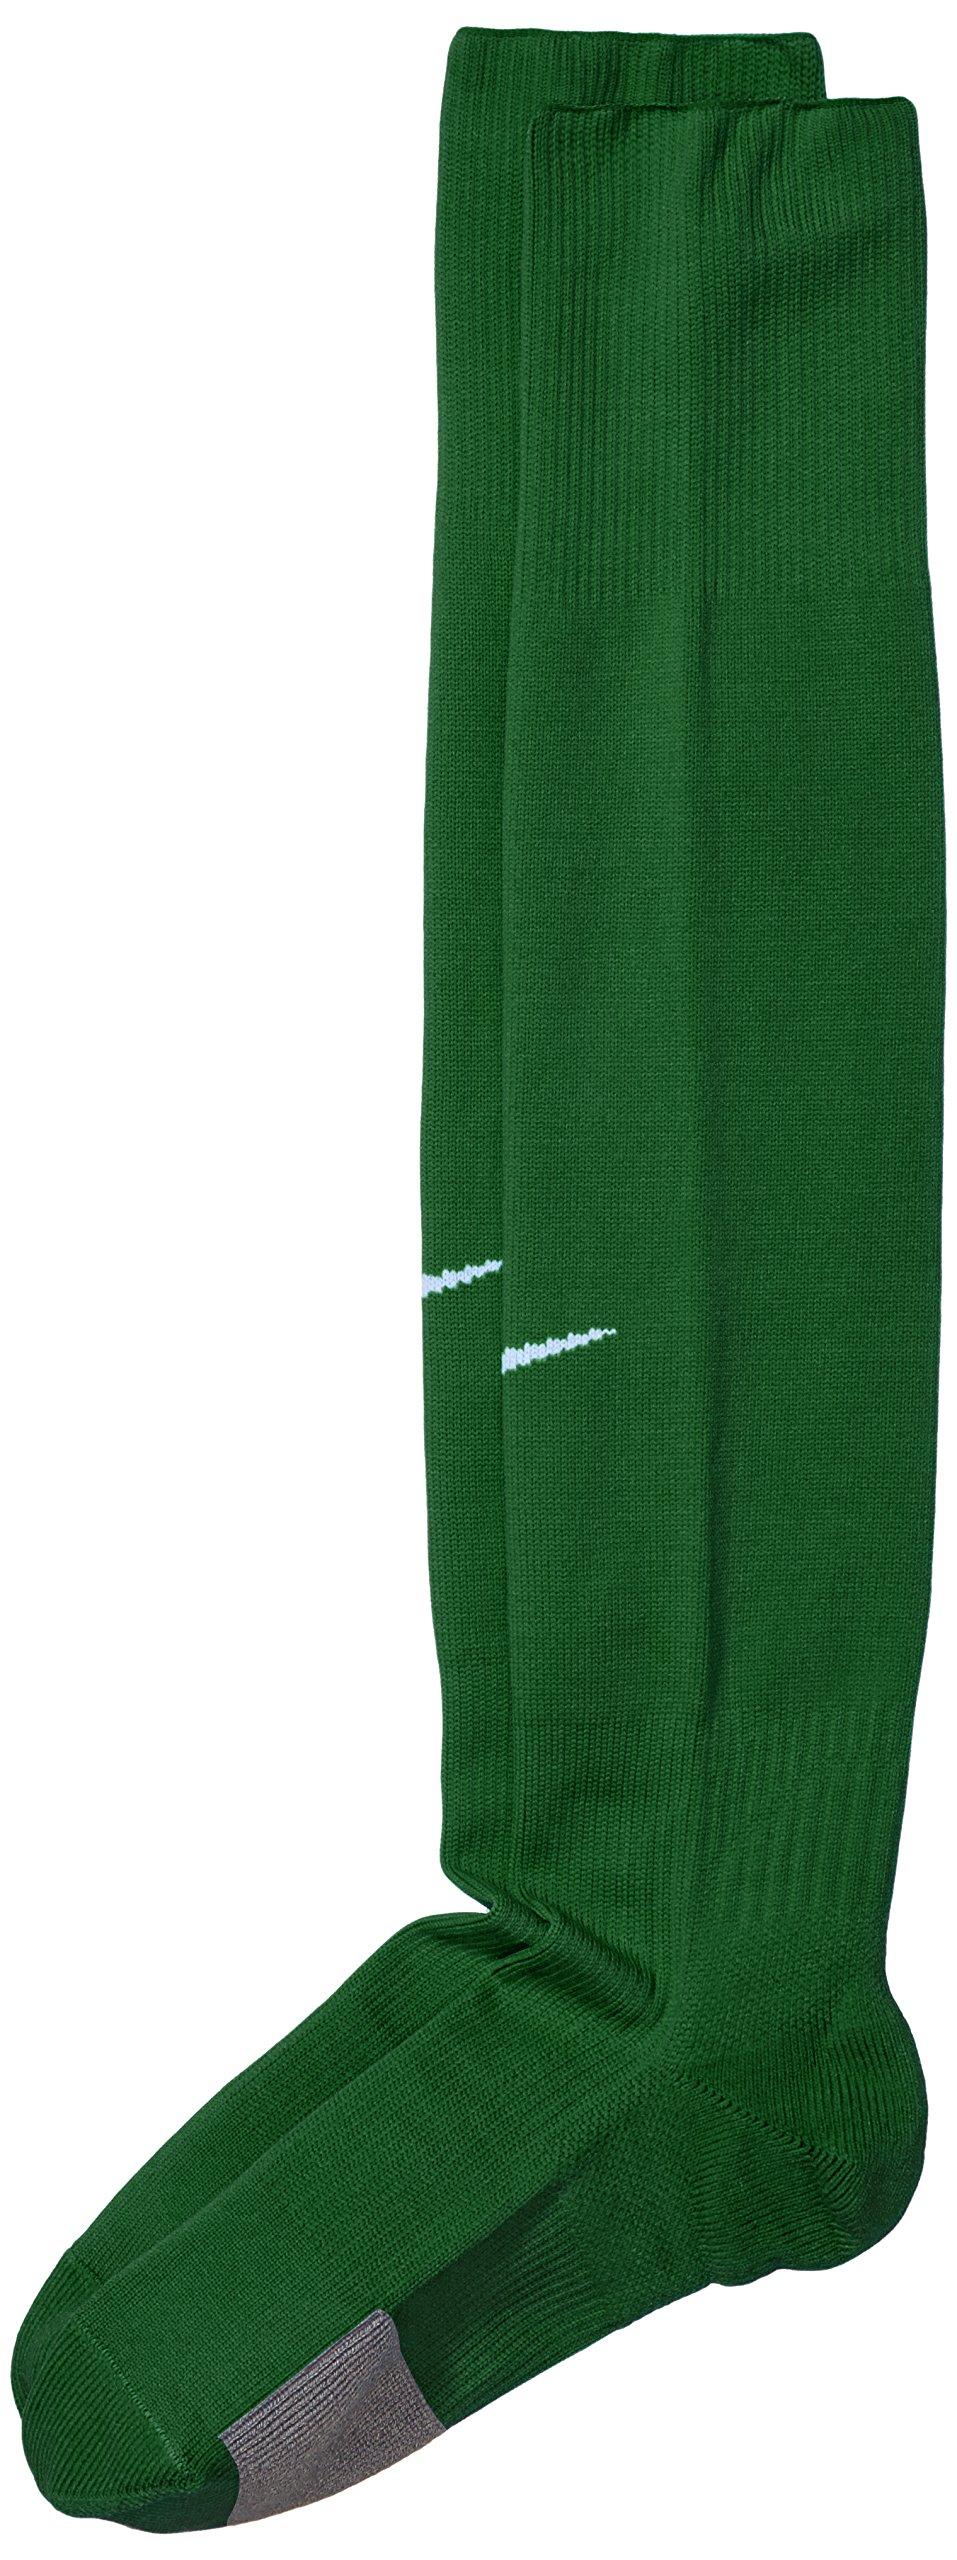 NIKE - Calcetines de fútbol para hombre, color verde (pine green/white)